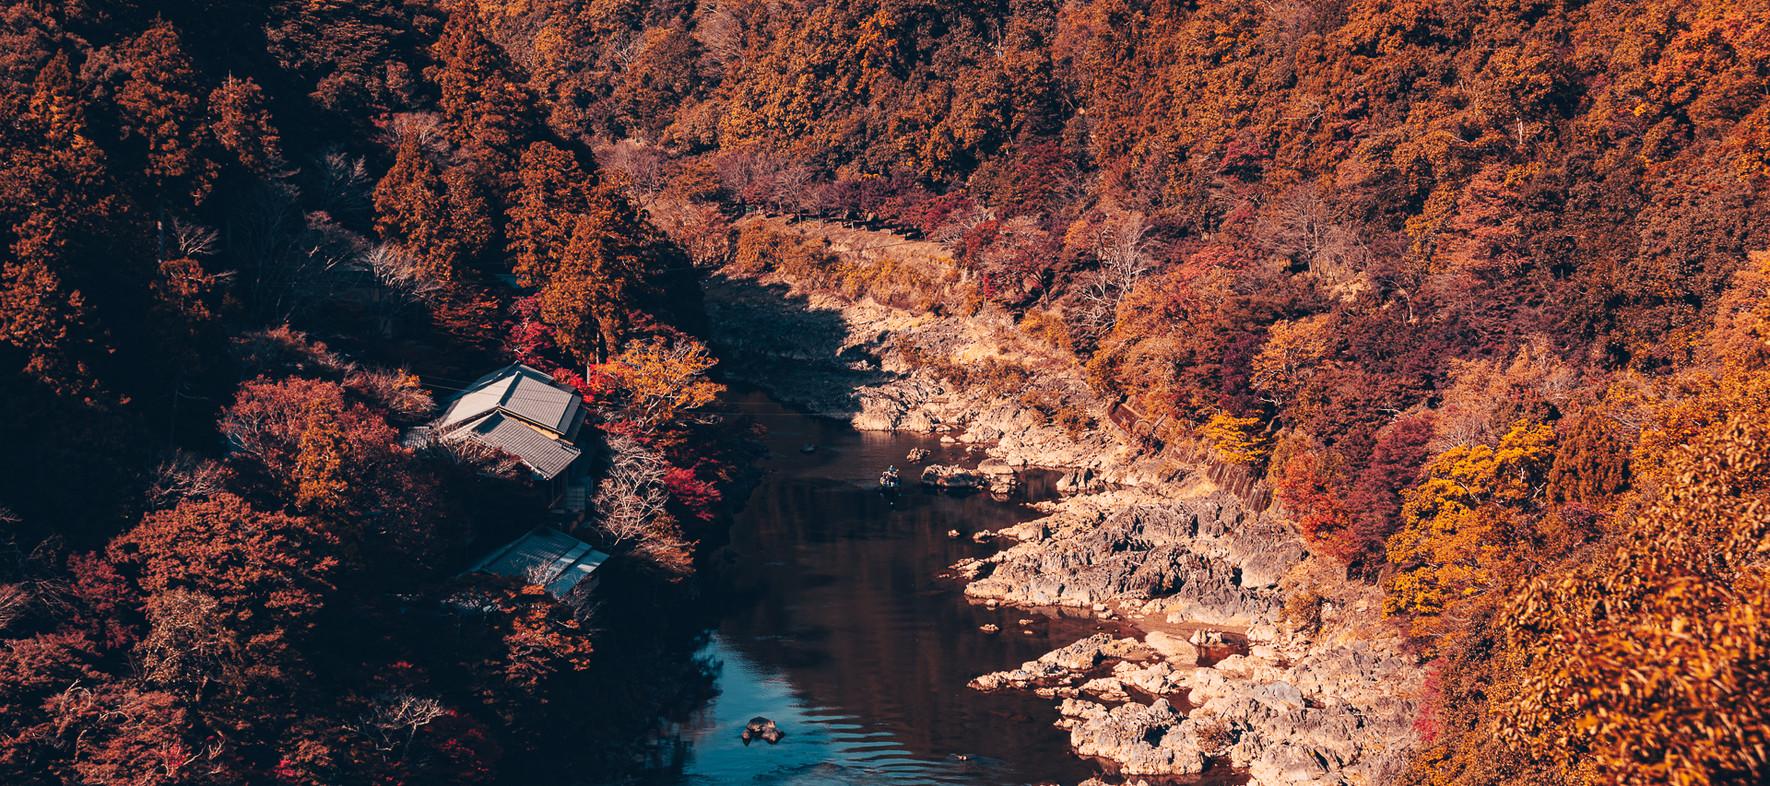 TKPA-Kyoto201911-0351-HDWH.jpg